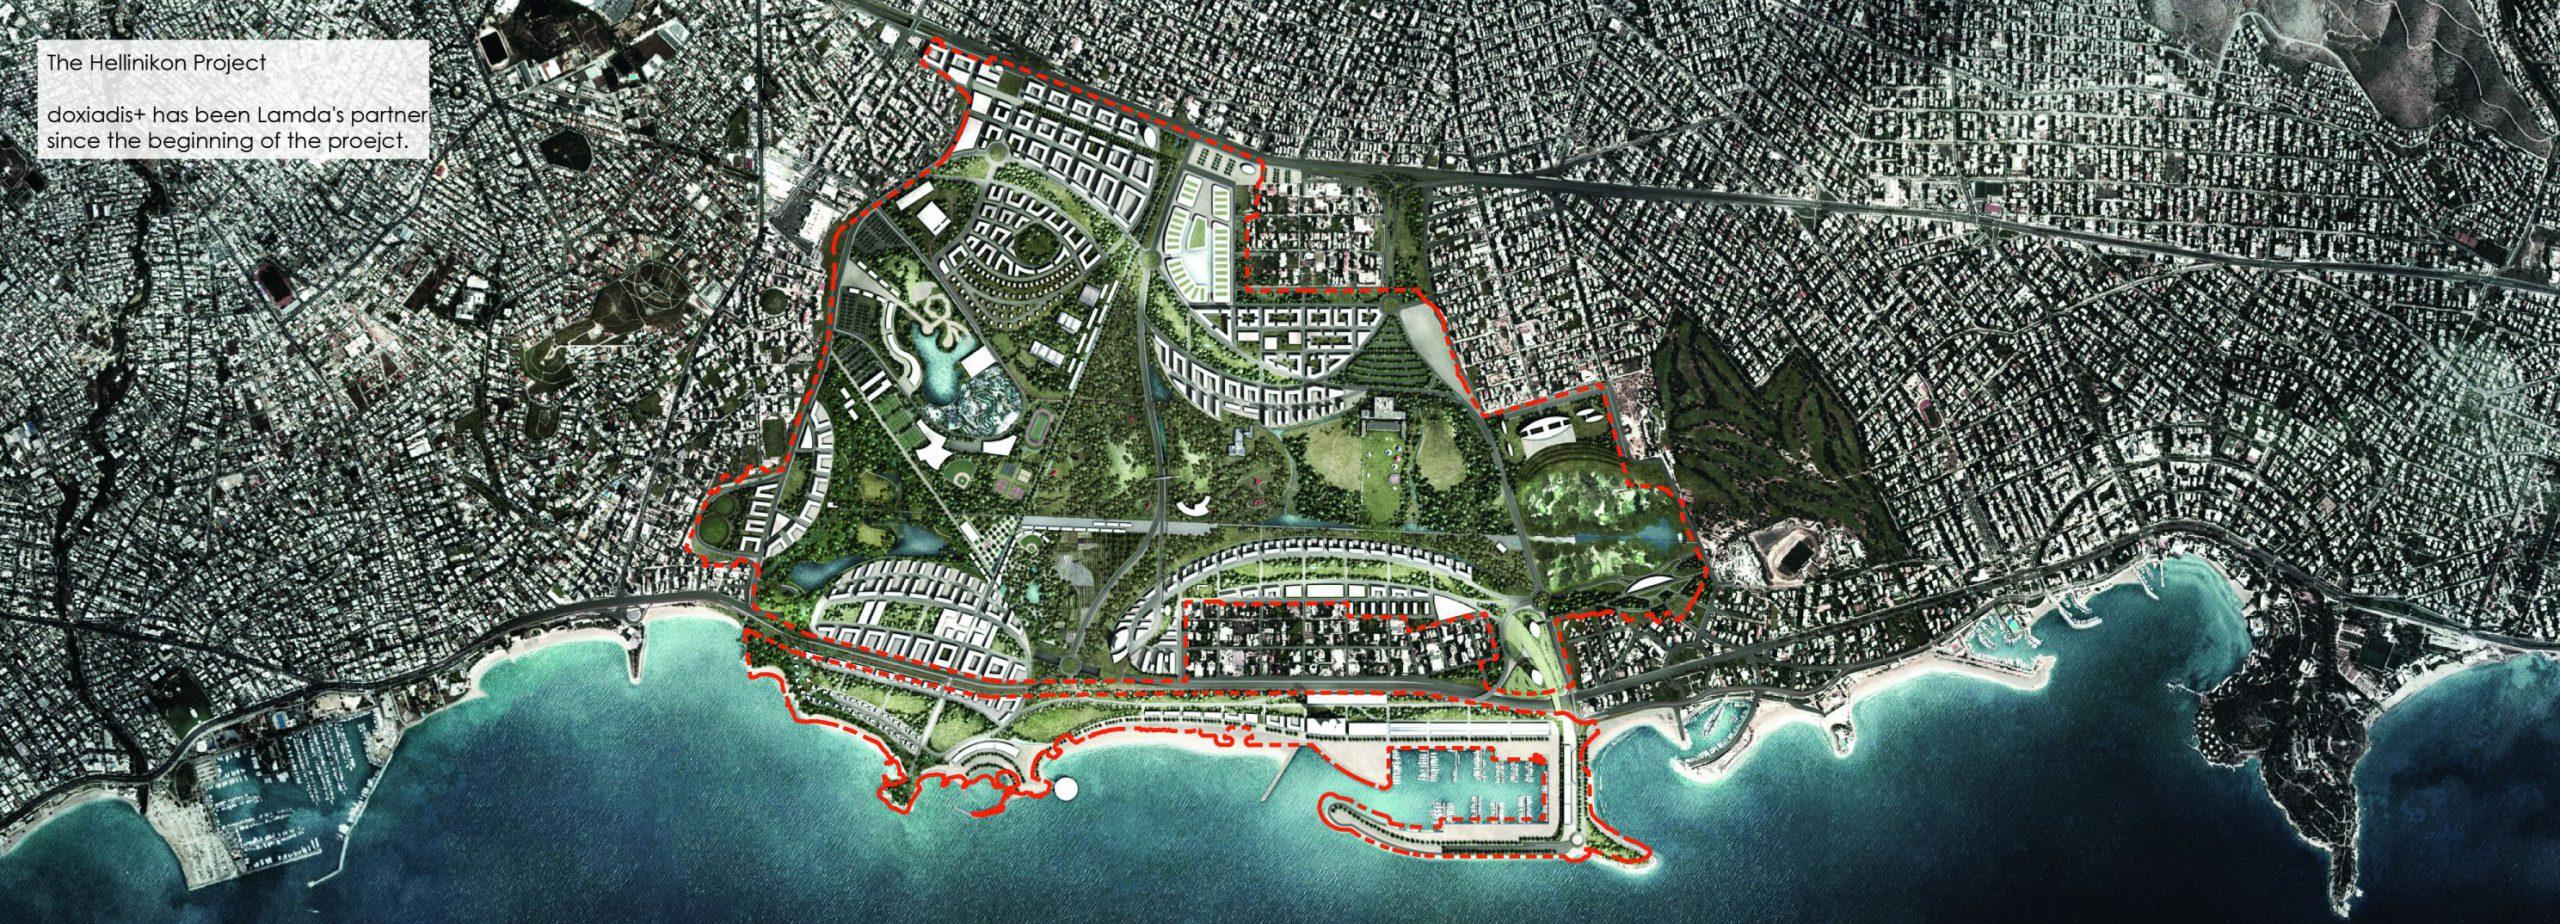 Metropolitan_Site_of_Hellinikon_Concept_Masterplan_Report_I 172